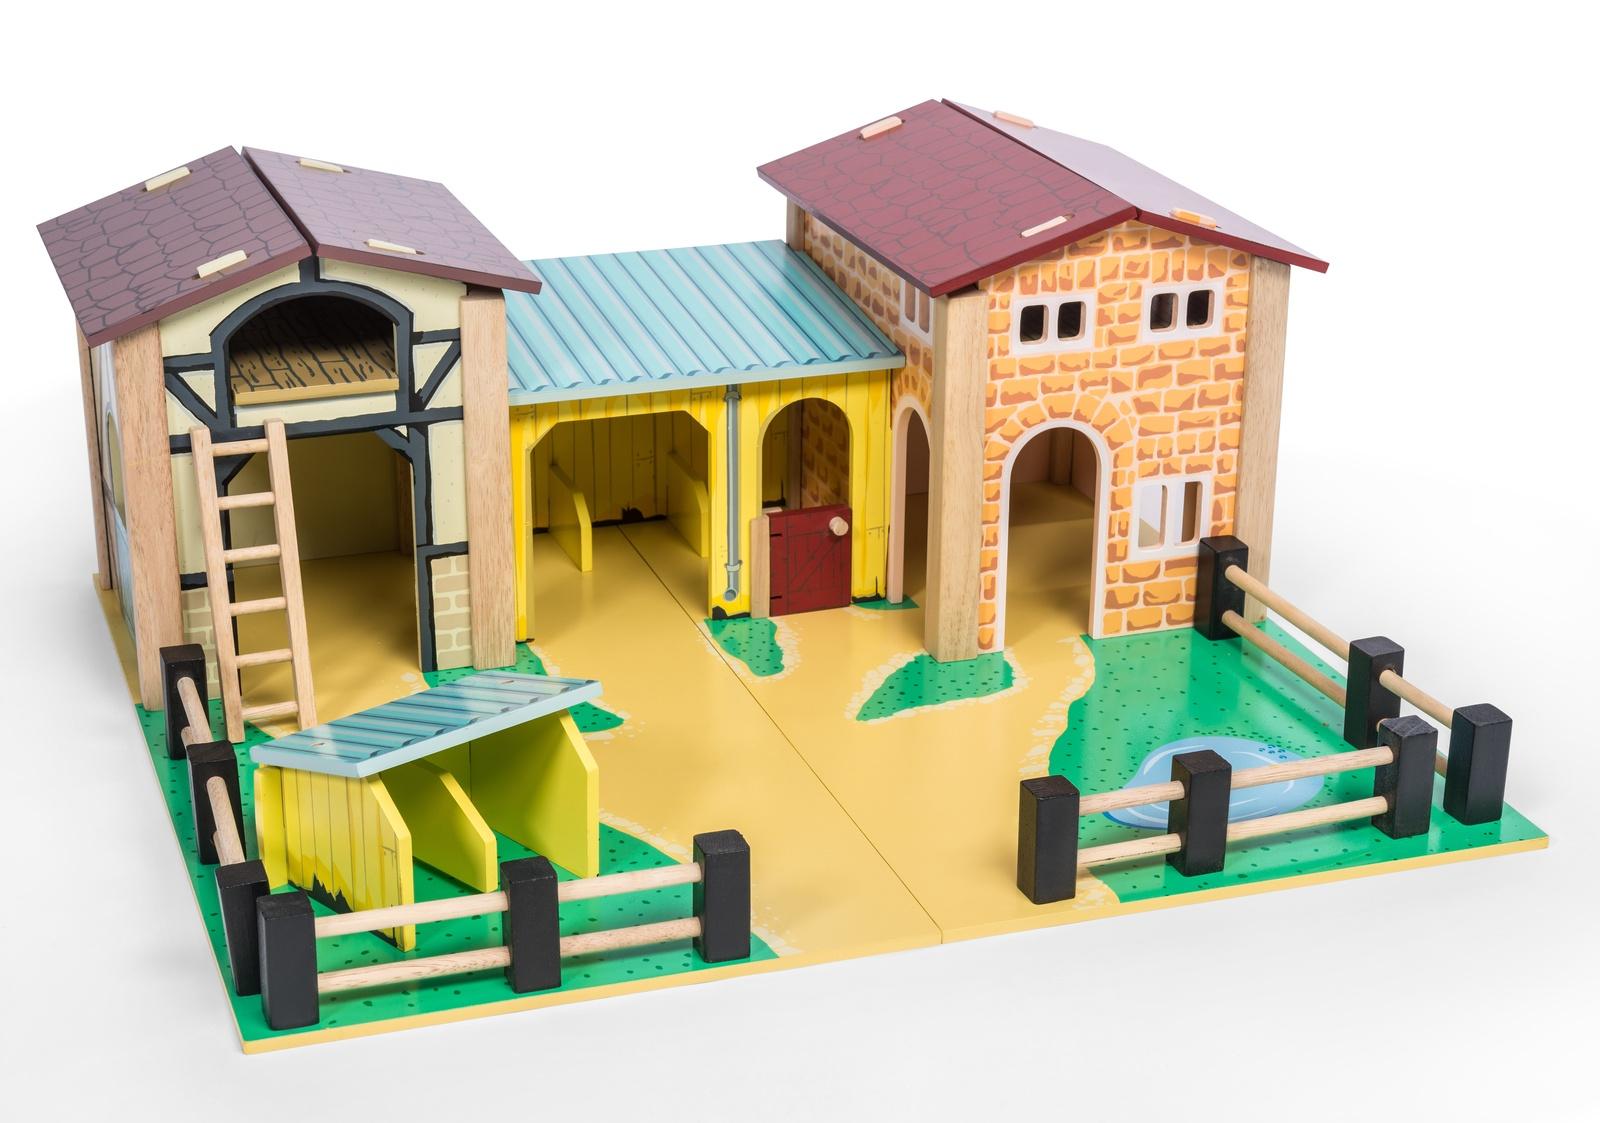 Игровой набор Ферма, Le Toy Van цена